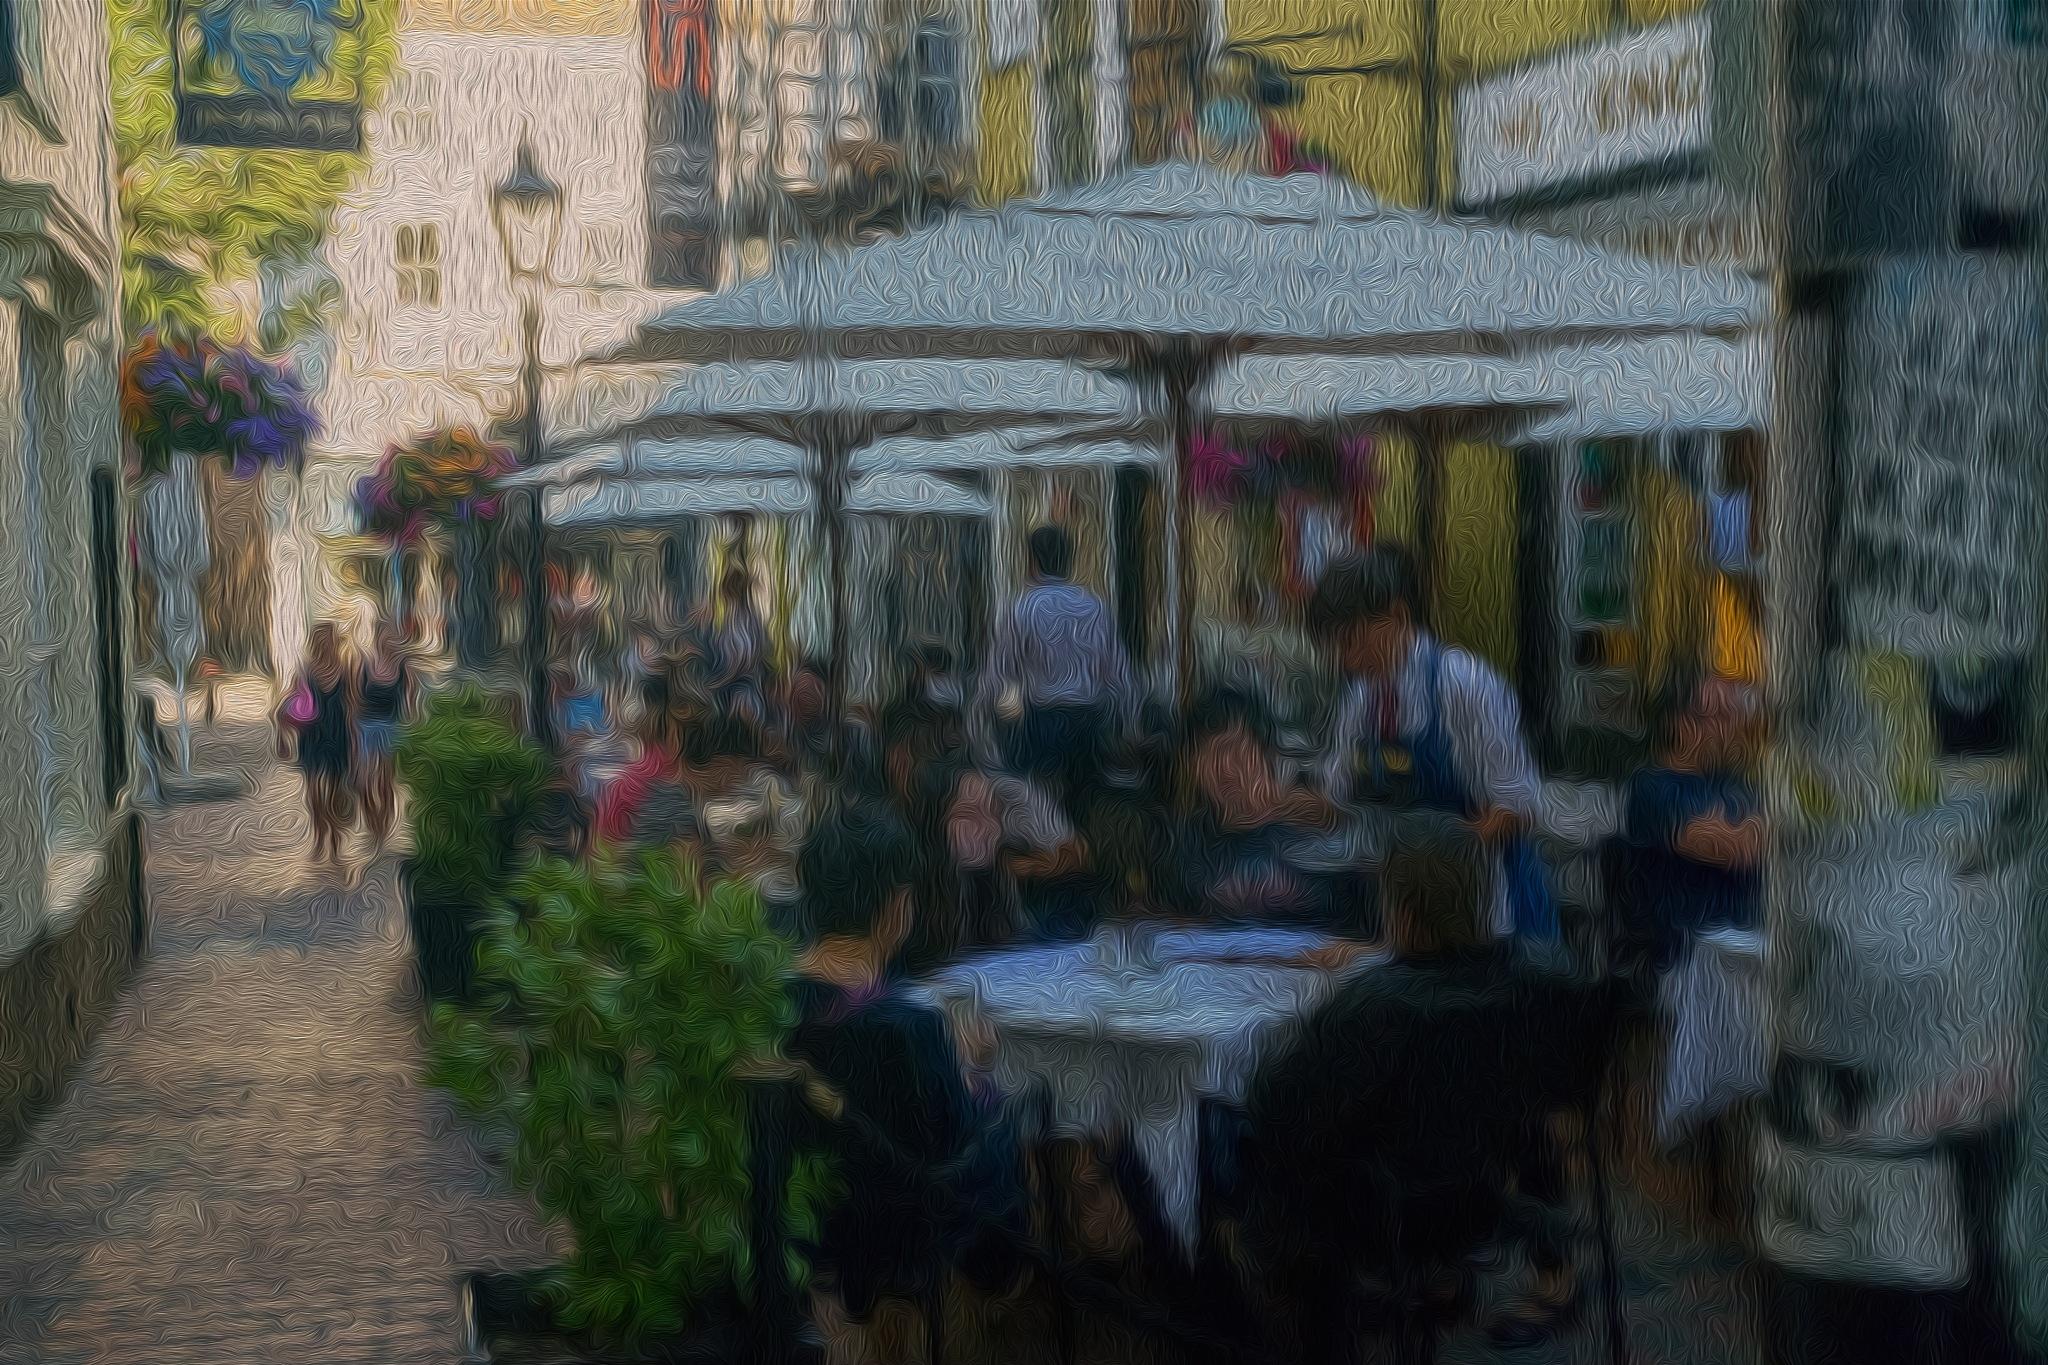 Brighton lanes - Restaurant by onasar